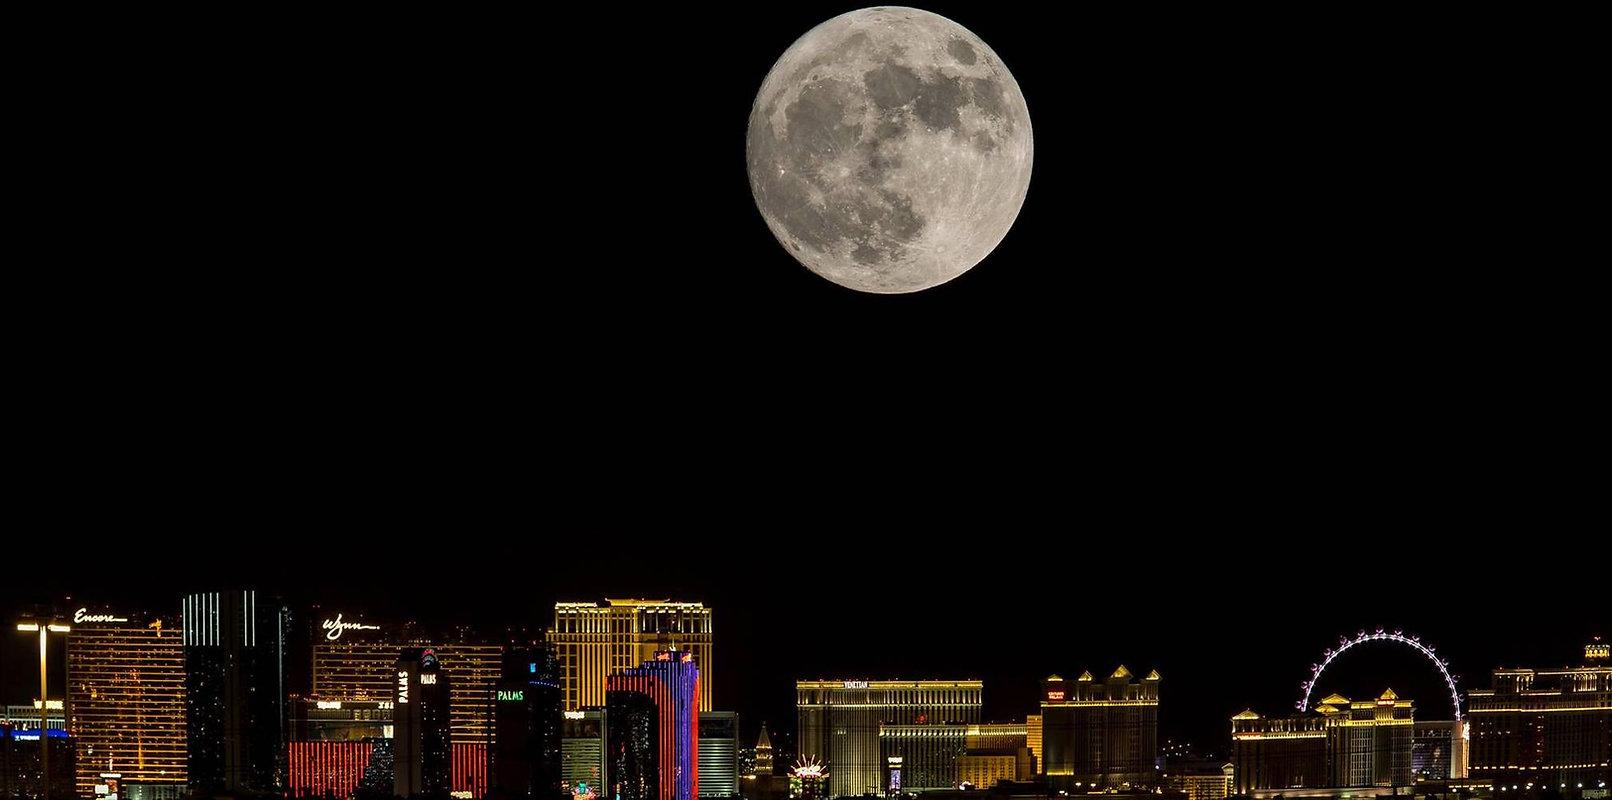 Cardiology in Las Vegas